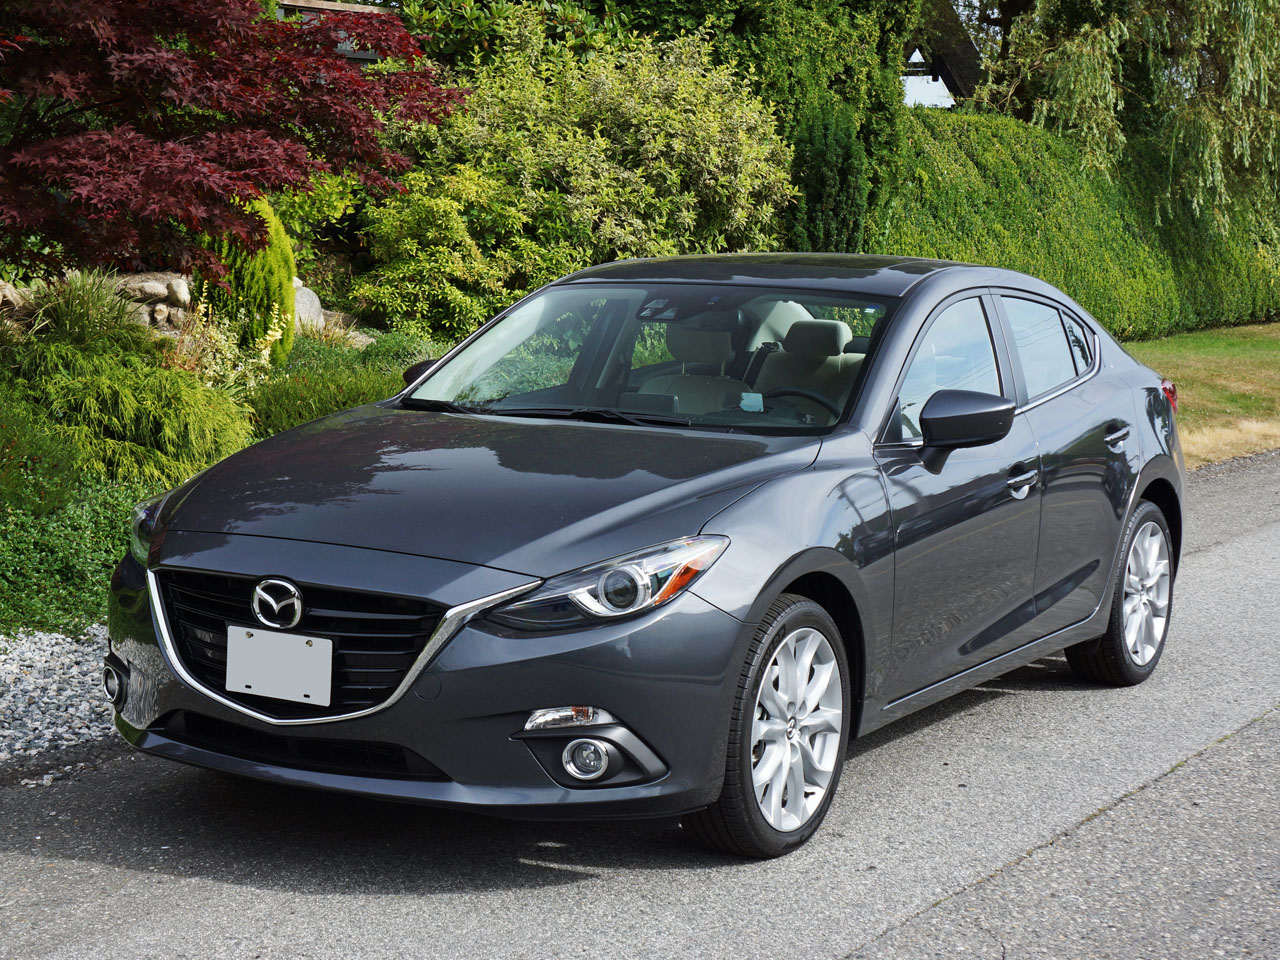 2014 Mazda3 Sedan GT Road Test Review   CarCostCanada™